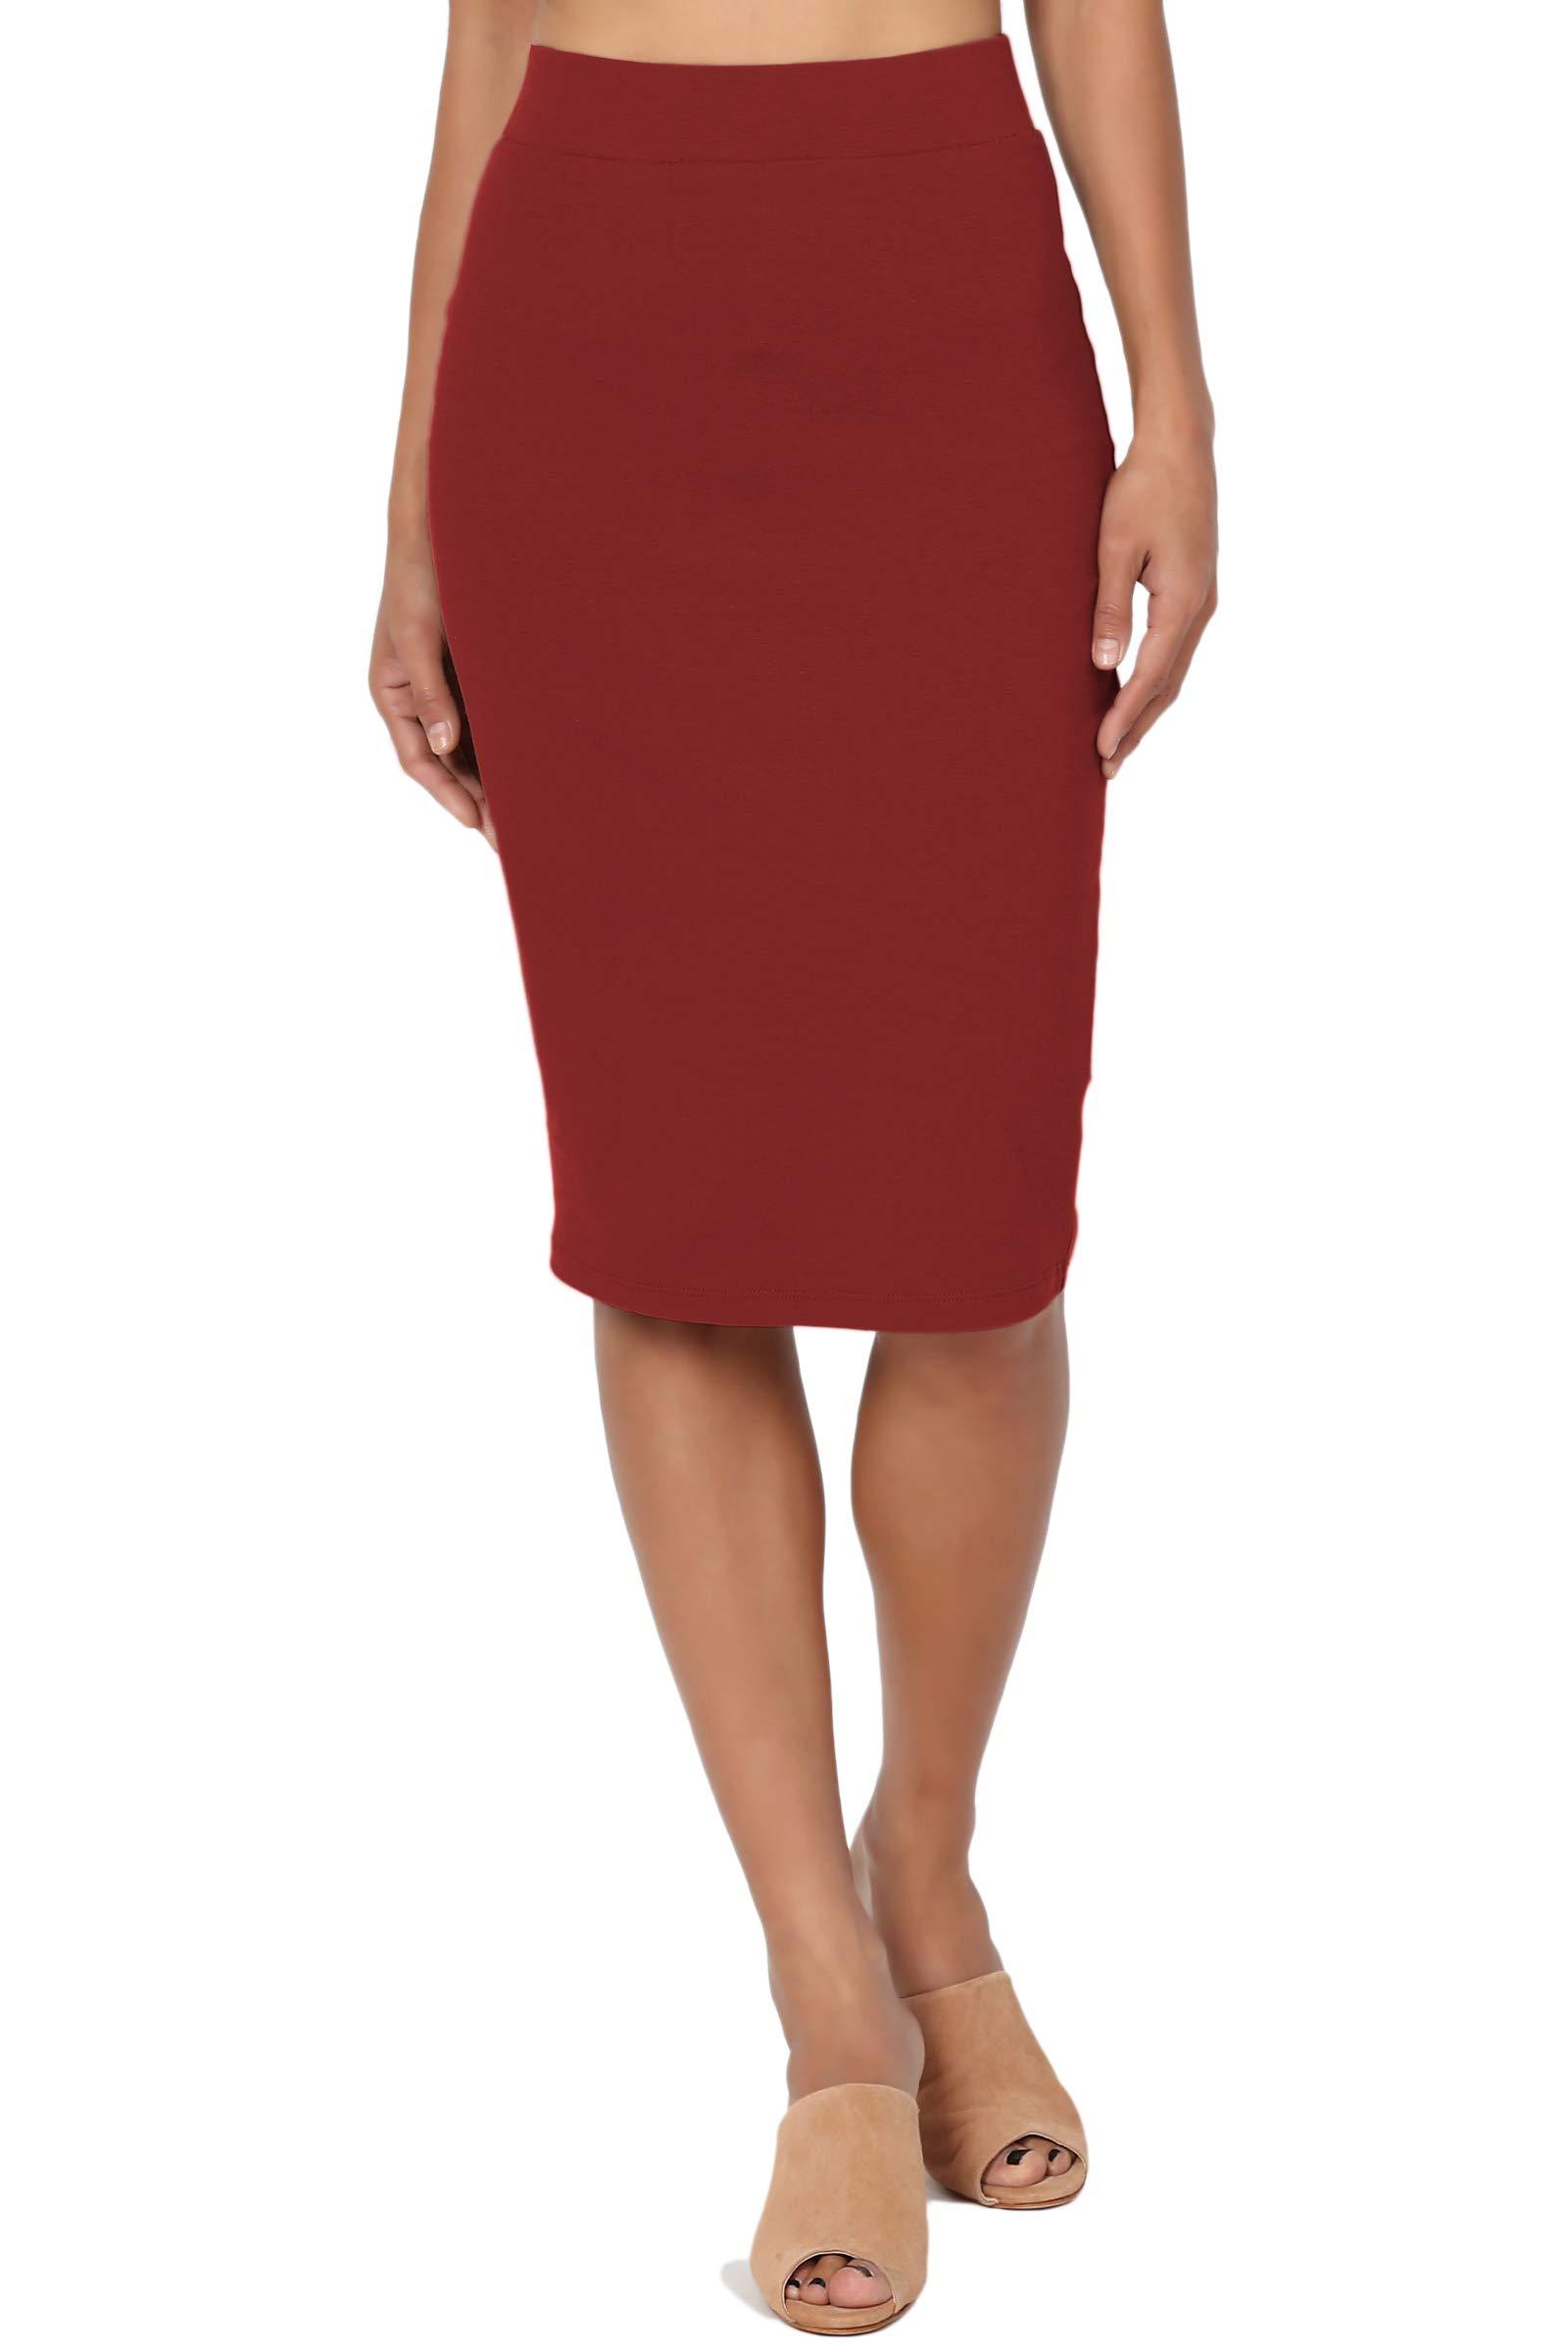 TheMogan Women's Stretch Cotton Elastic High Waist Pencil Midi Skirt Brick S